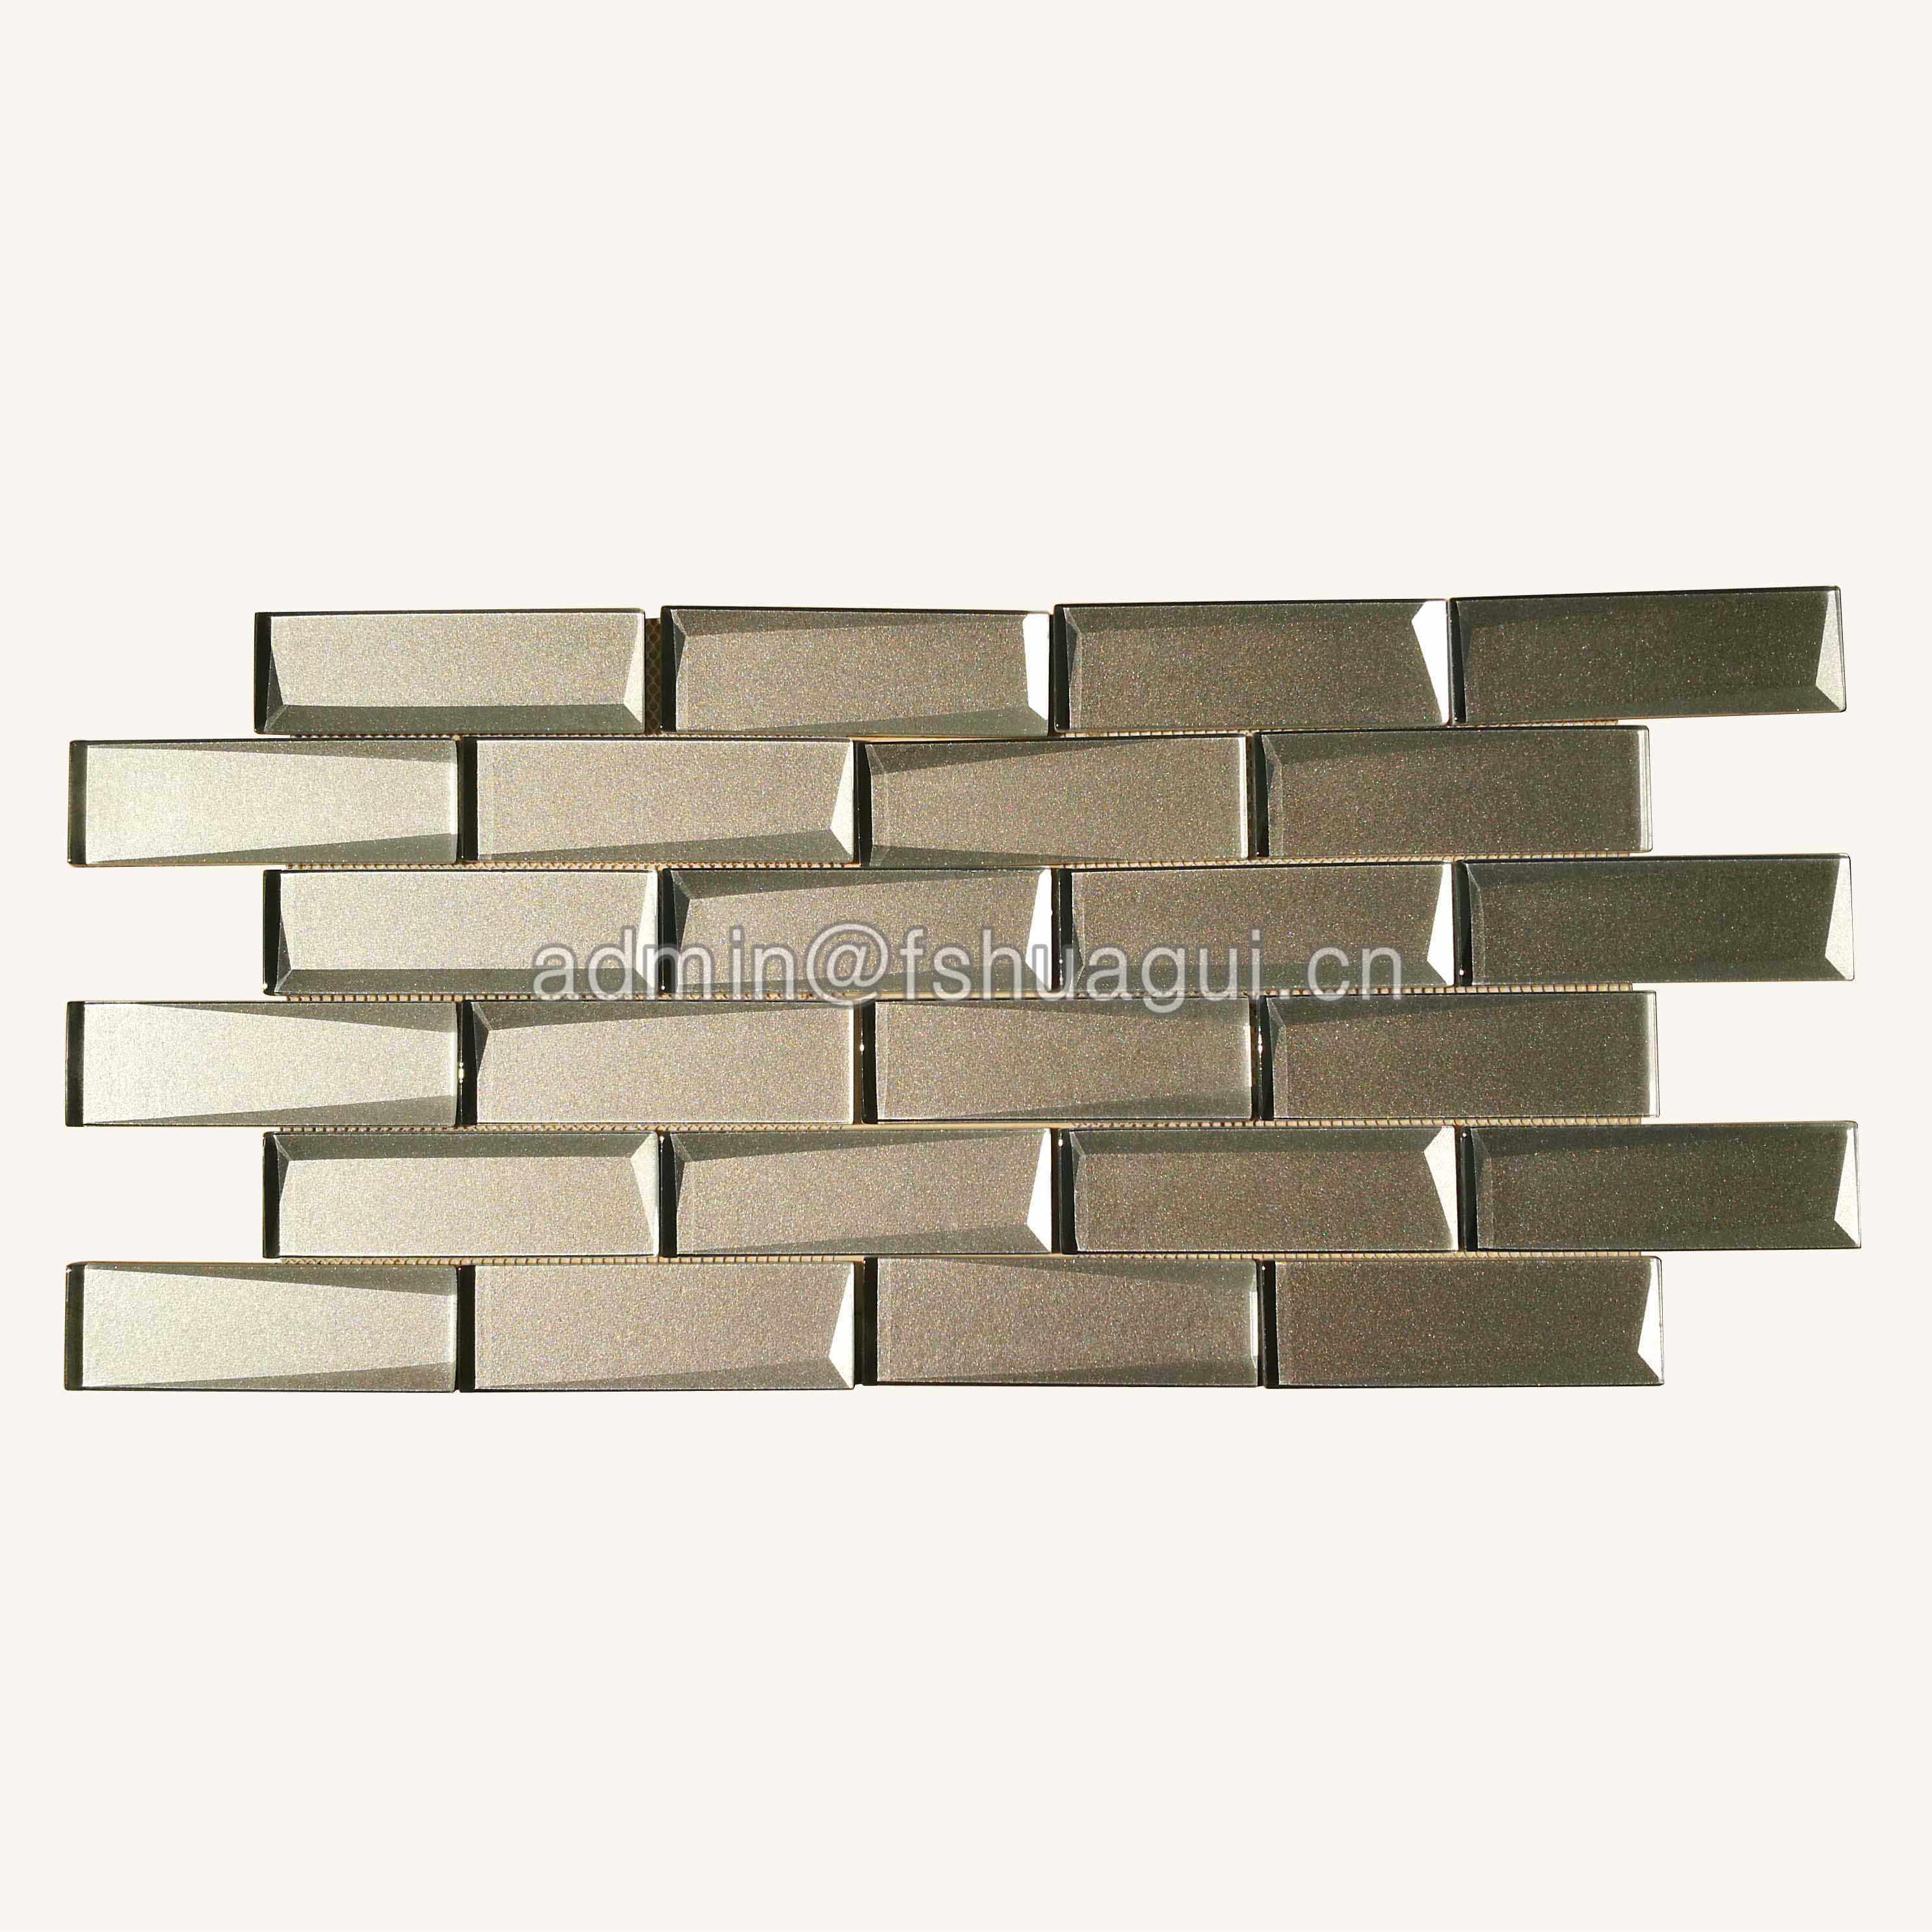 Huagui Cold Spray Glass Mosaic Tile for Wall Backsplash HG-HB014 GLASS SUBWAY TILE image7